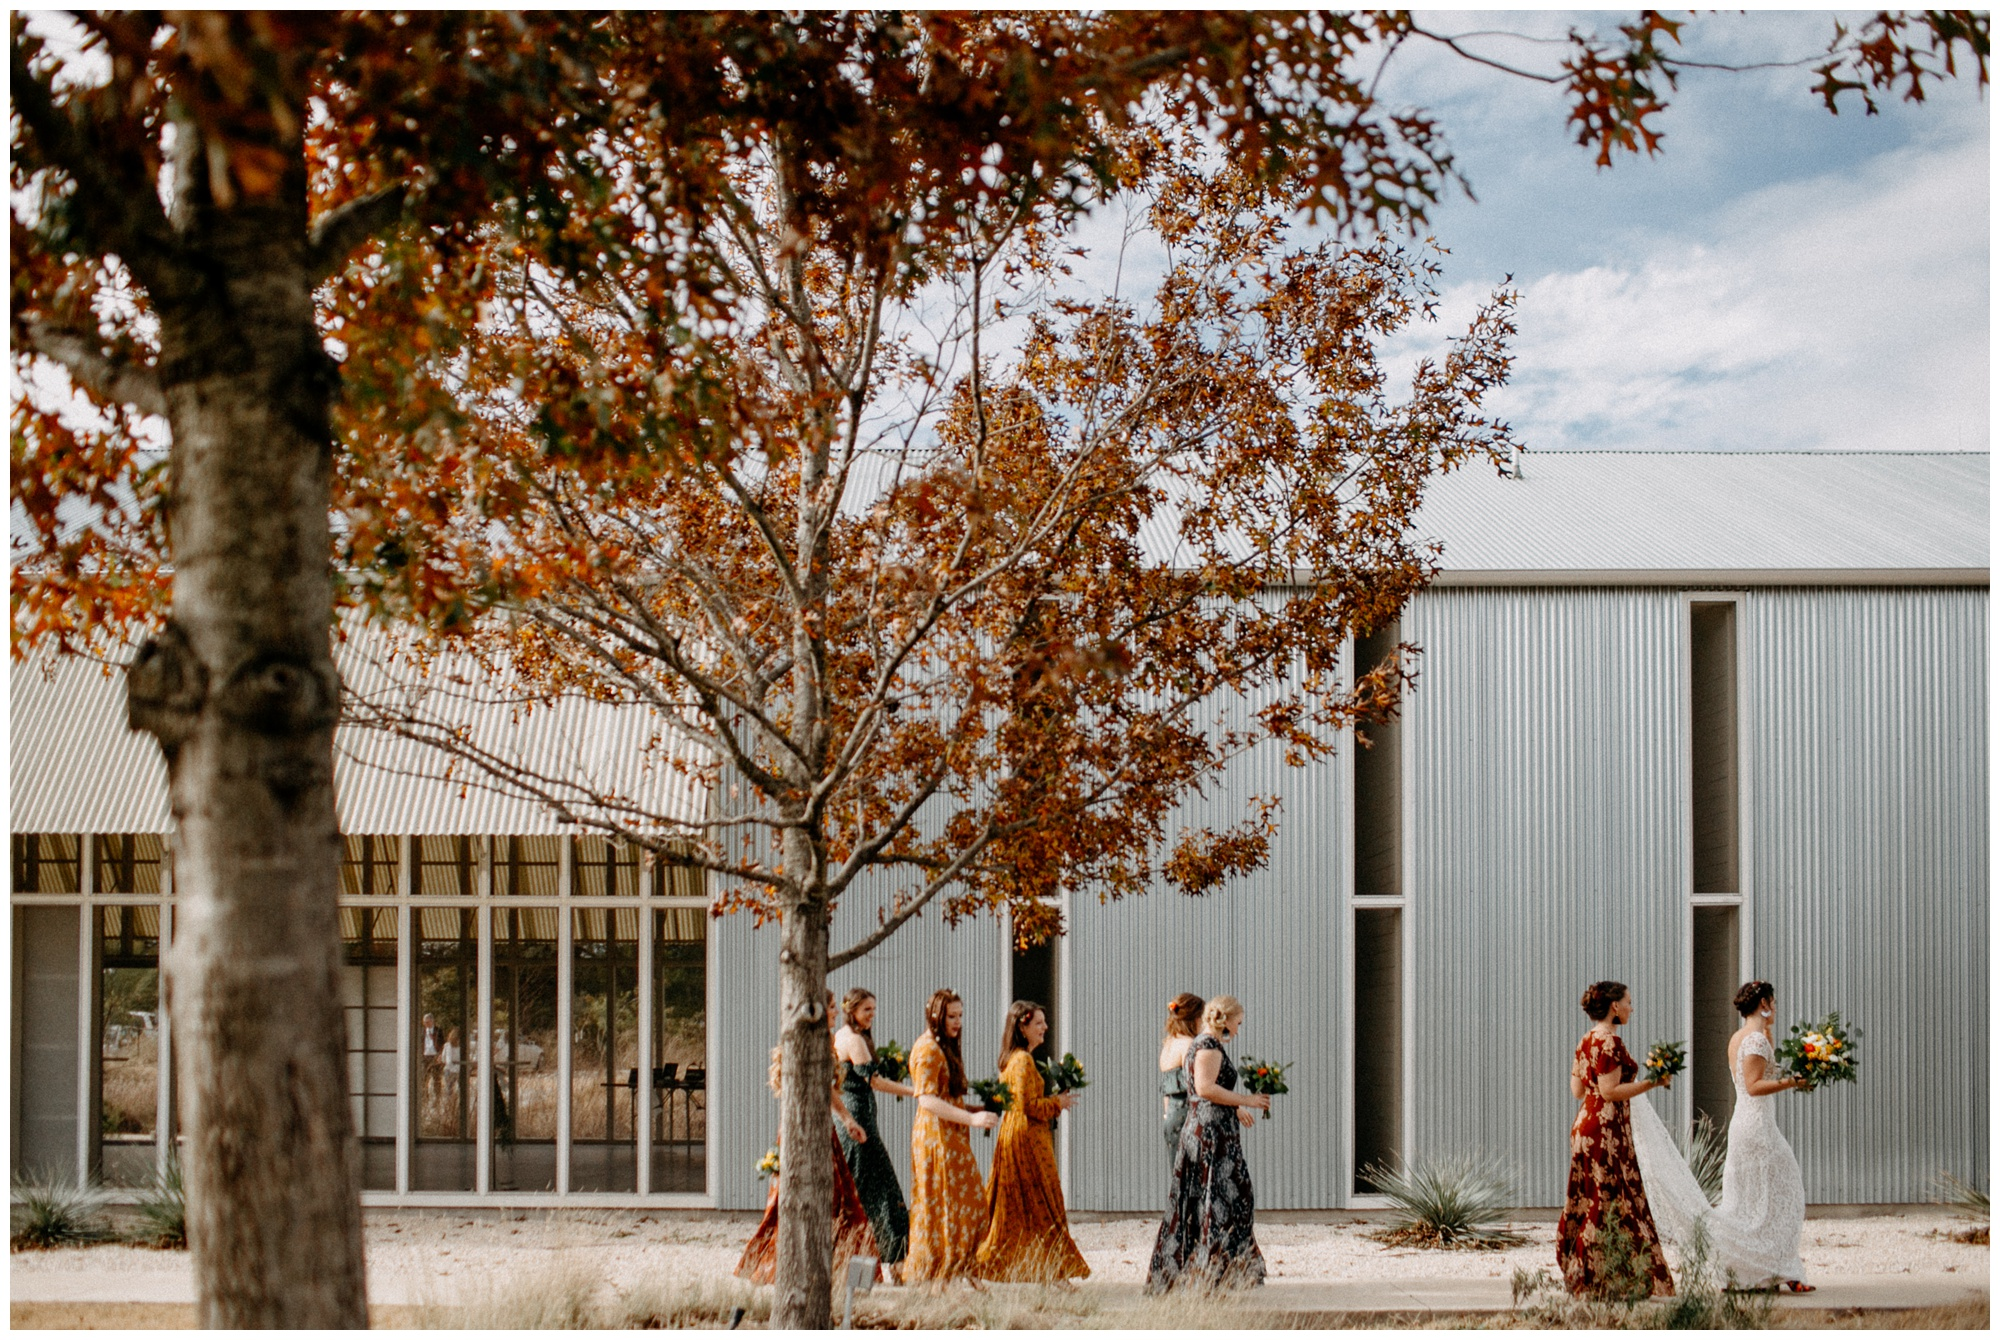 AUSTIN-TEXAS-PROSPECT-HOUSE-WEDDING-VENUE-PHOTOGRAPHY25754.JPG